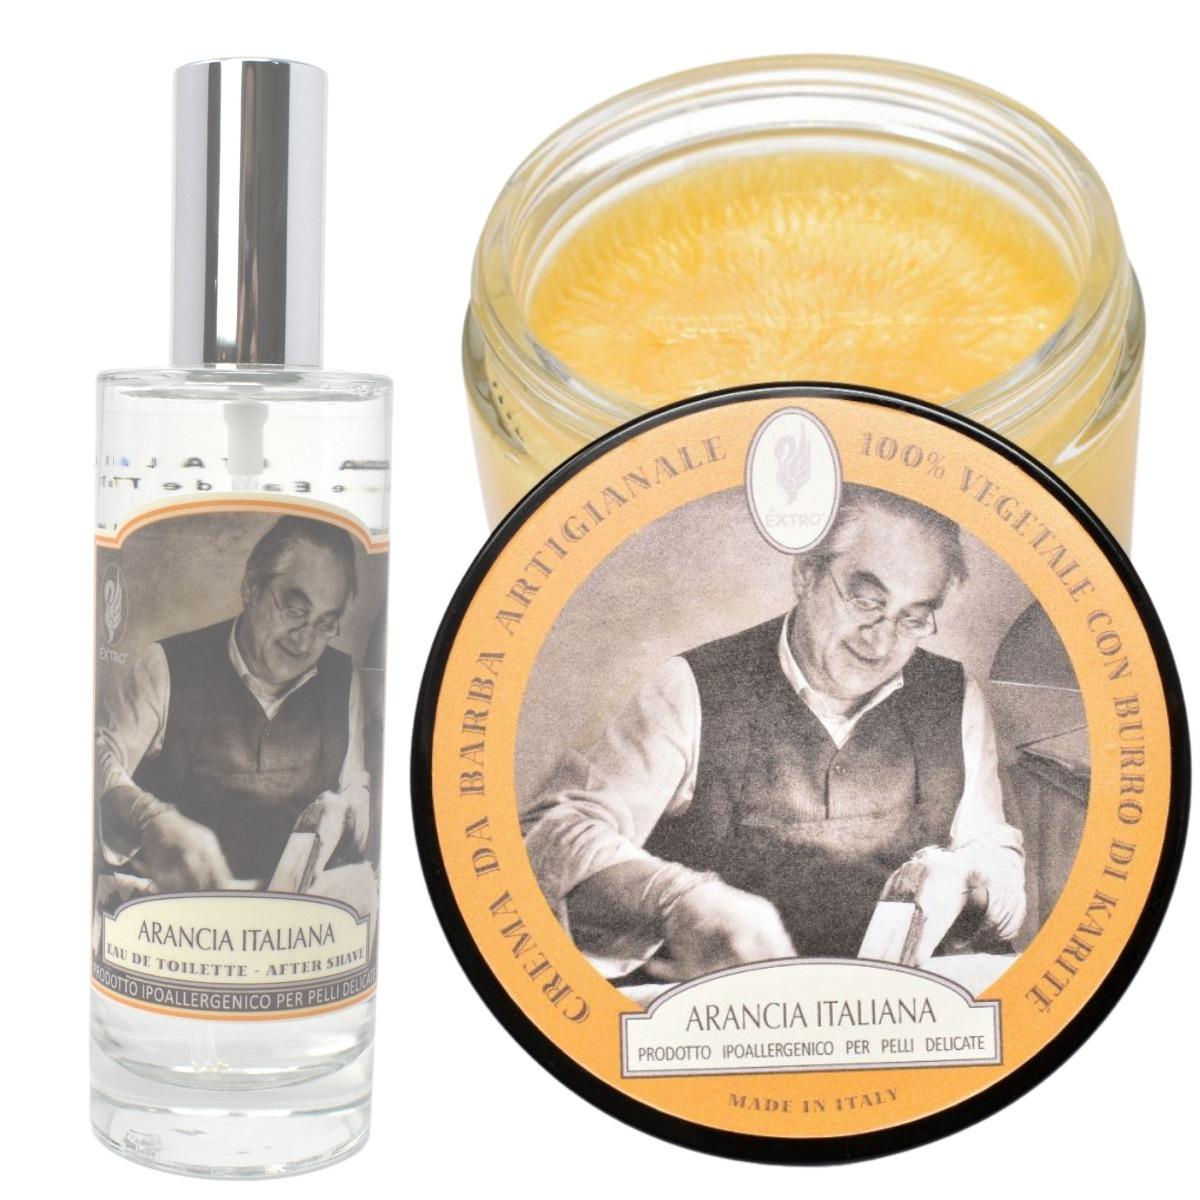 Extro Cosmesi Arancia Shaving Cream & Aftershave Splash Set